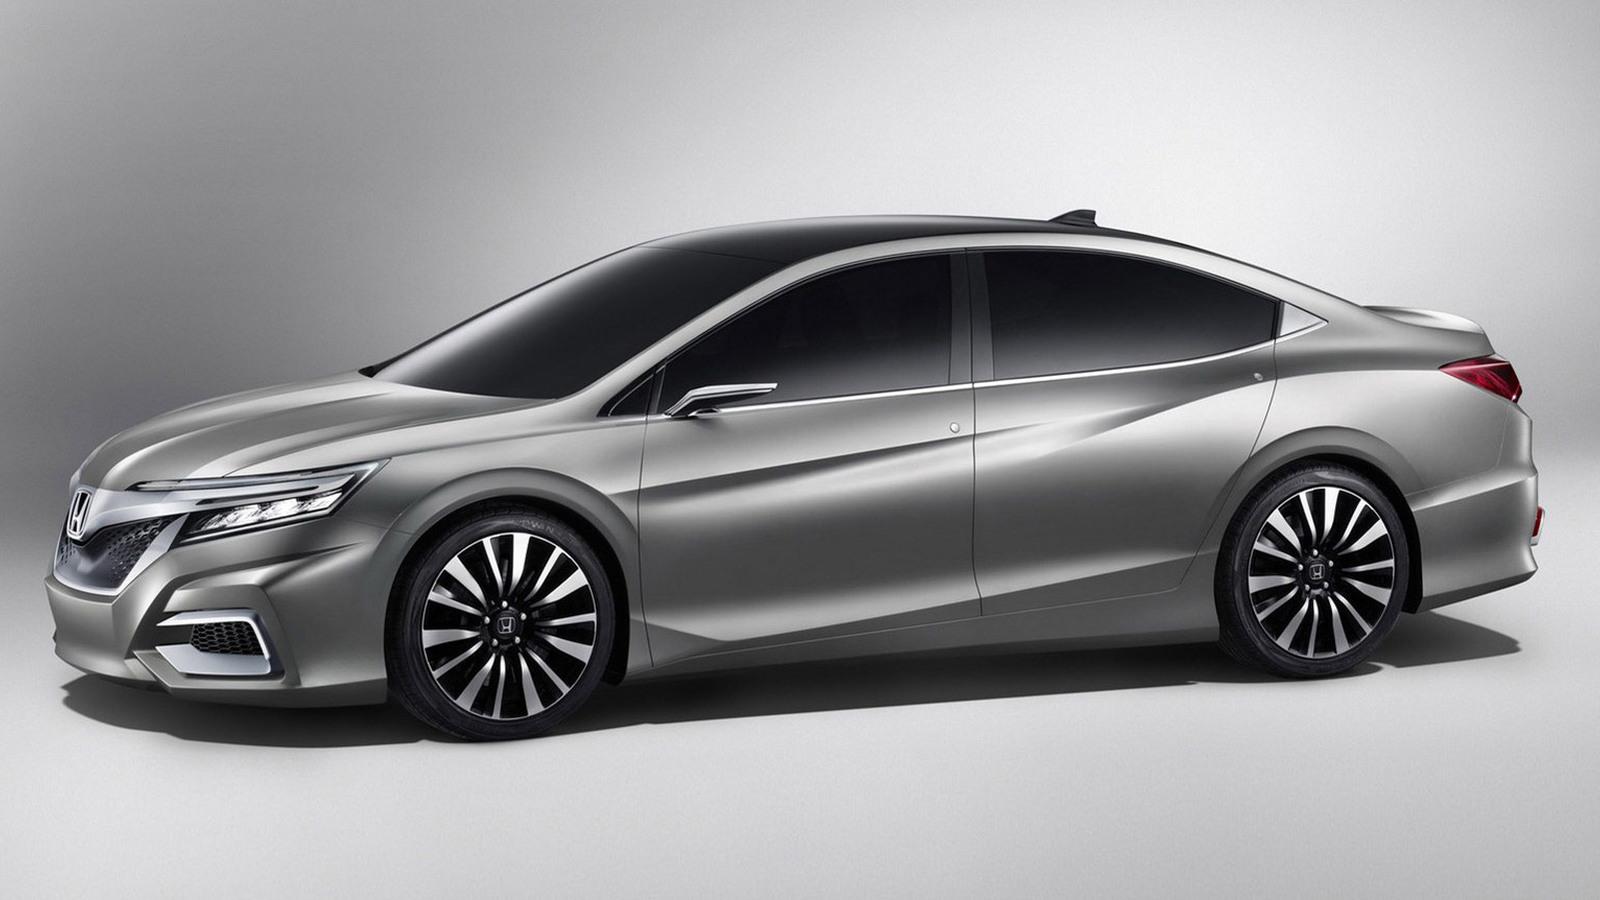 2012 Honda Concept C